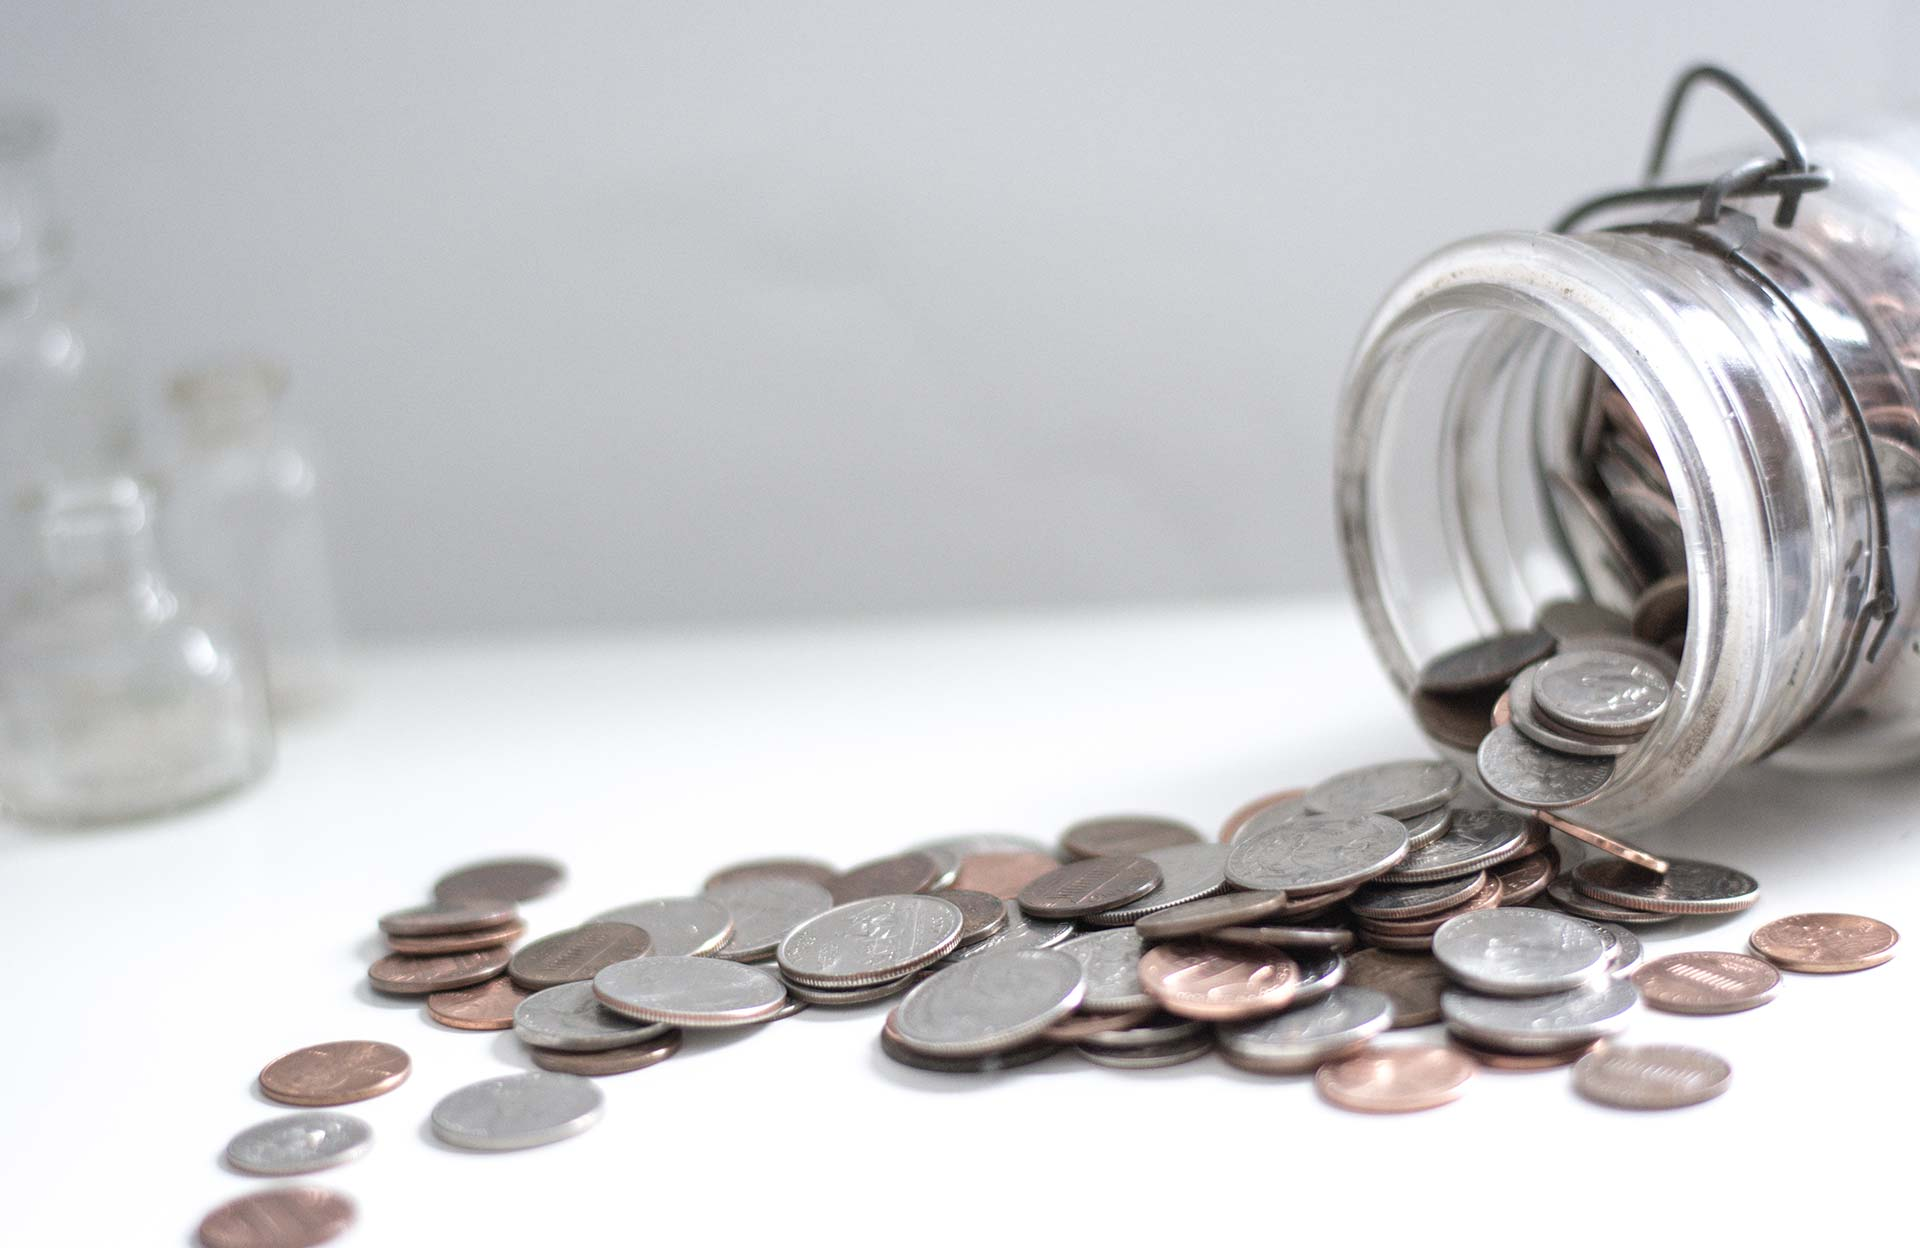 Chiller Maintenance Saves Money